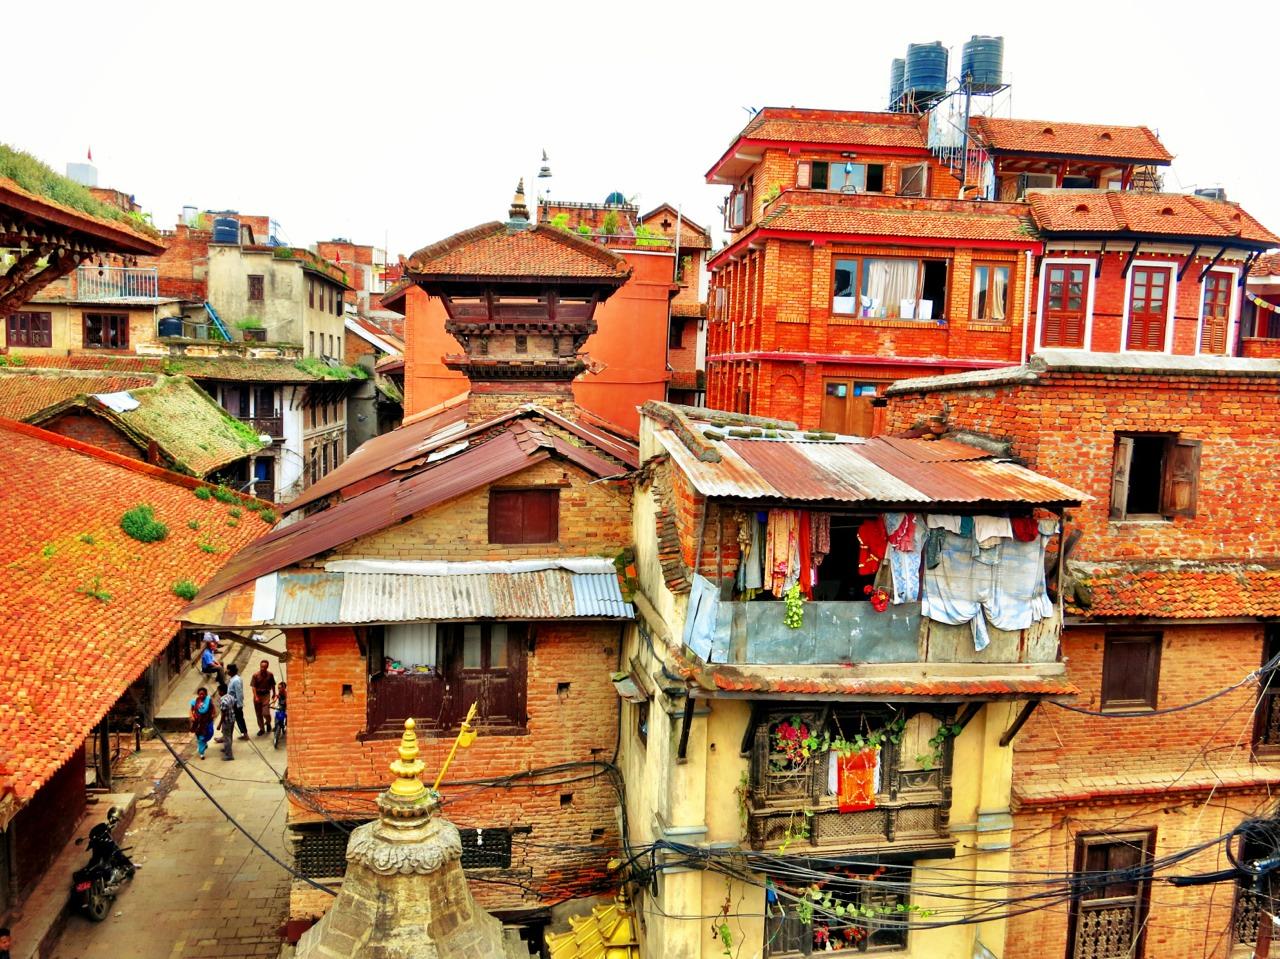 Houses in Kathmandu.